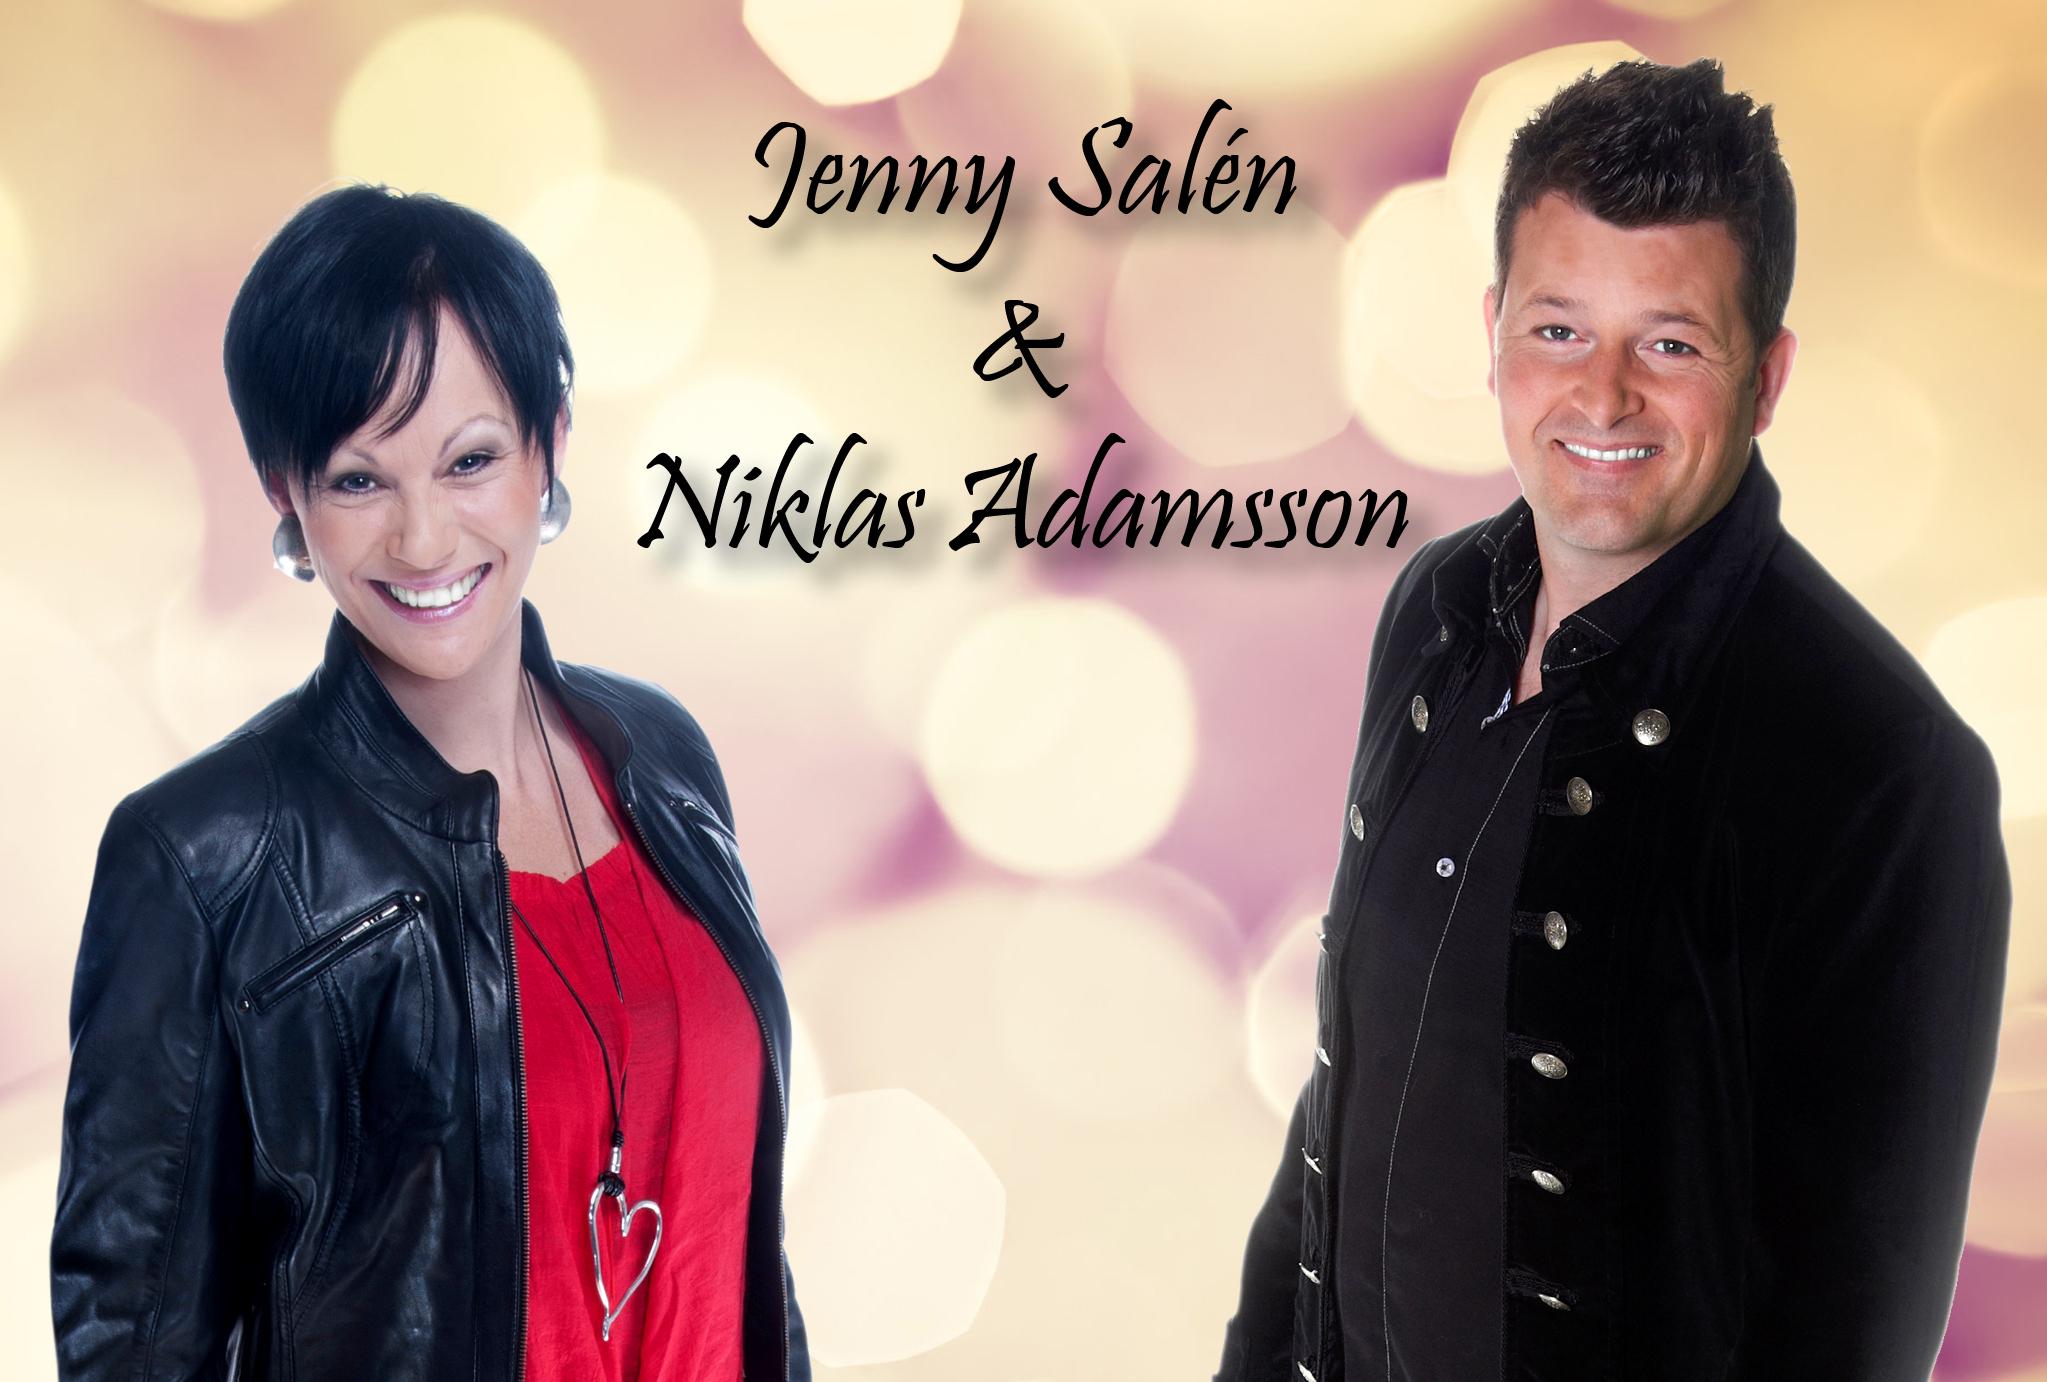 Jenny Salén & Niklas Adamsson